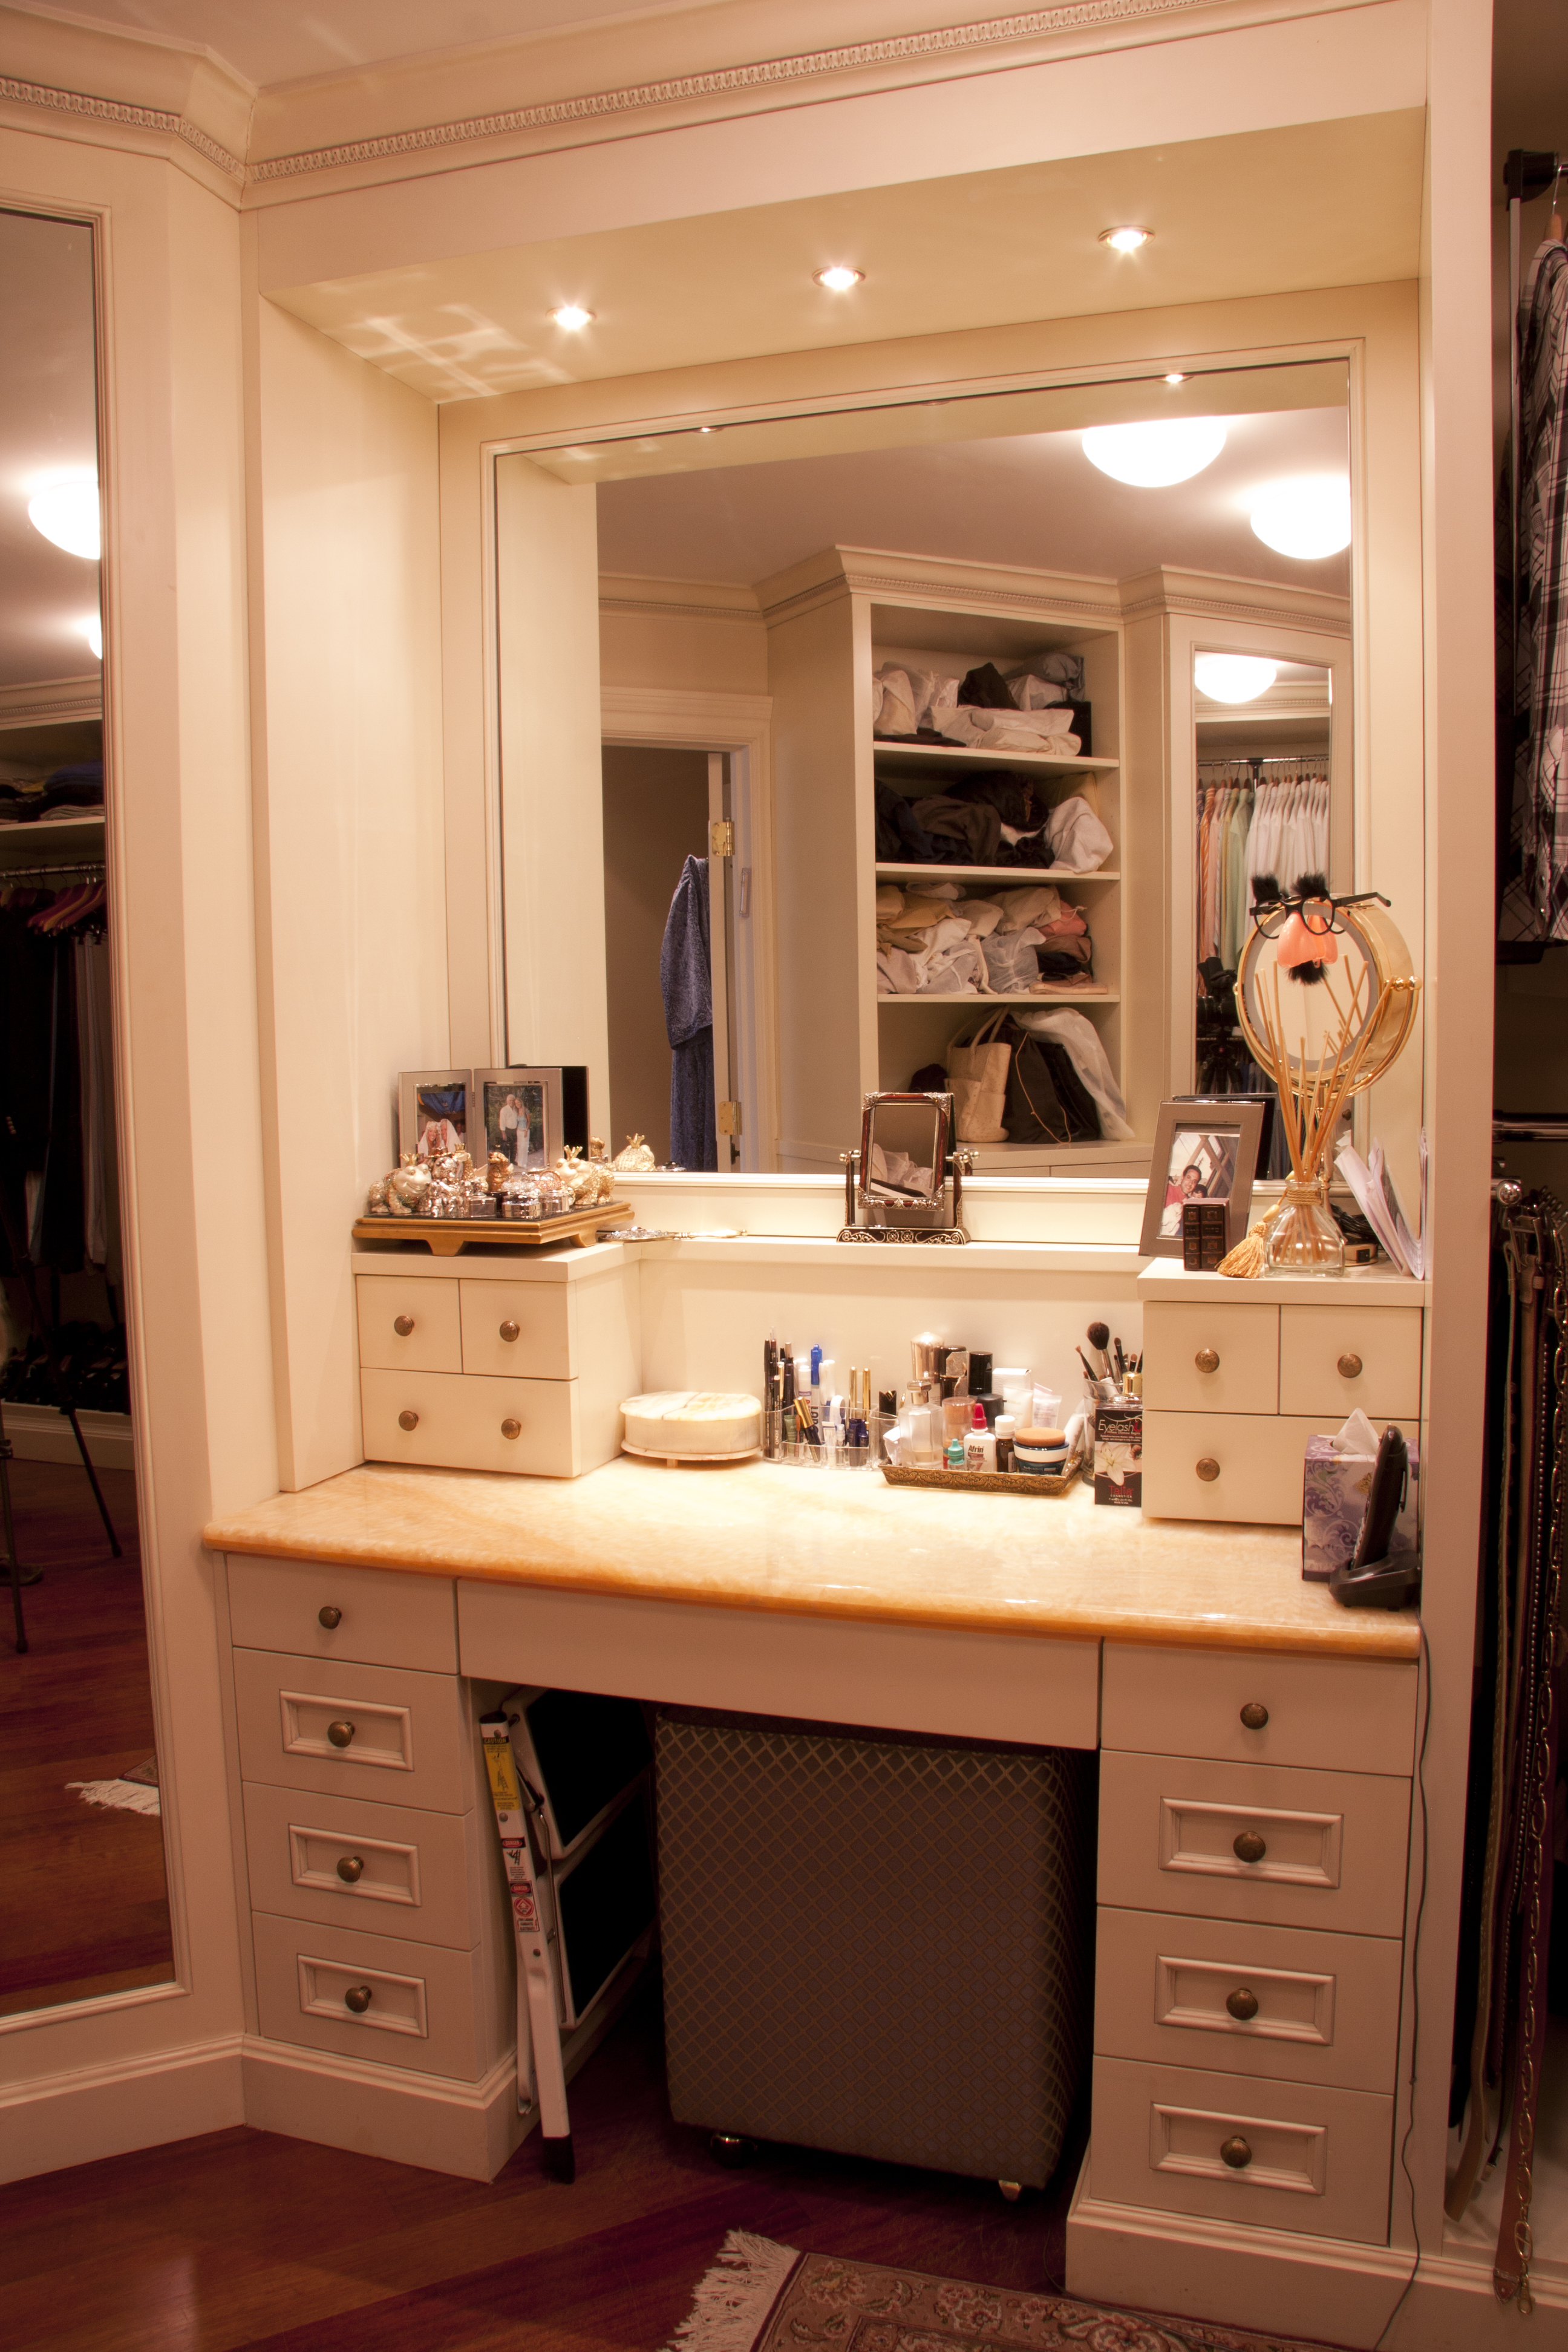 Captivating Bathroom Dressing Table Vanity Of Inspiring Desk With Lights And Ikea Set Acnn Decor